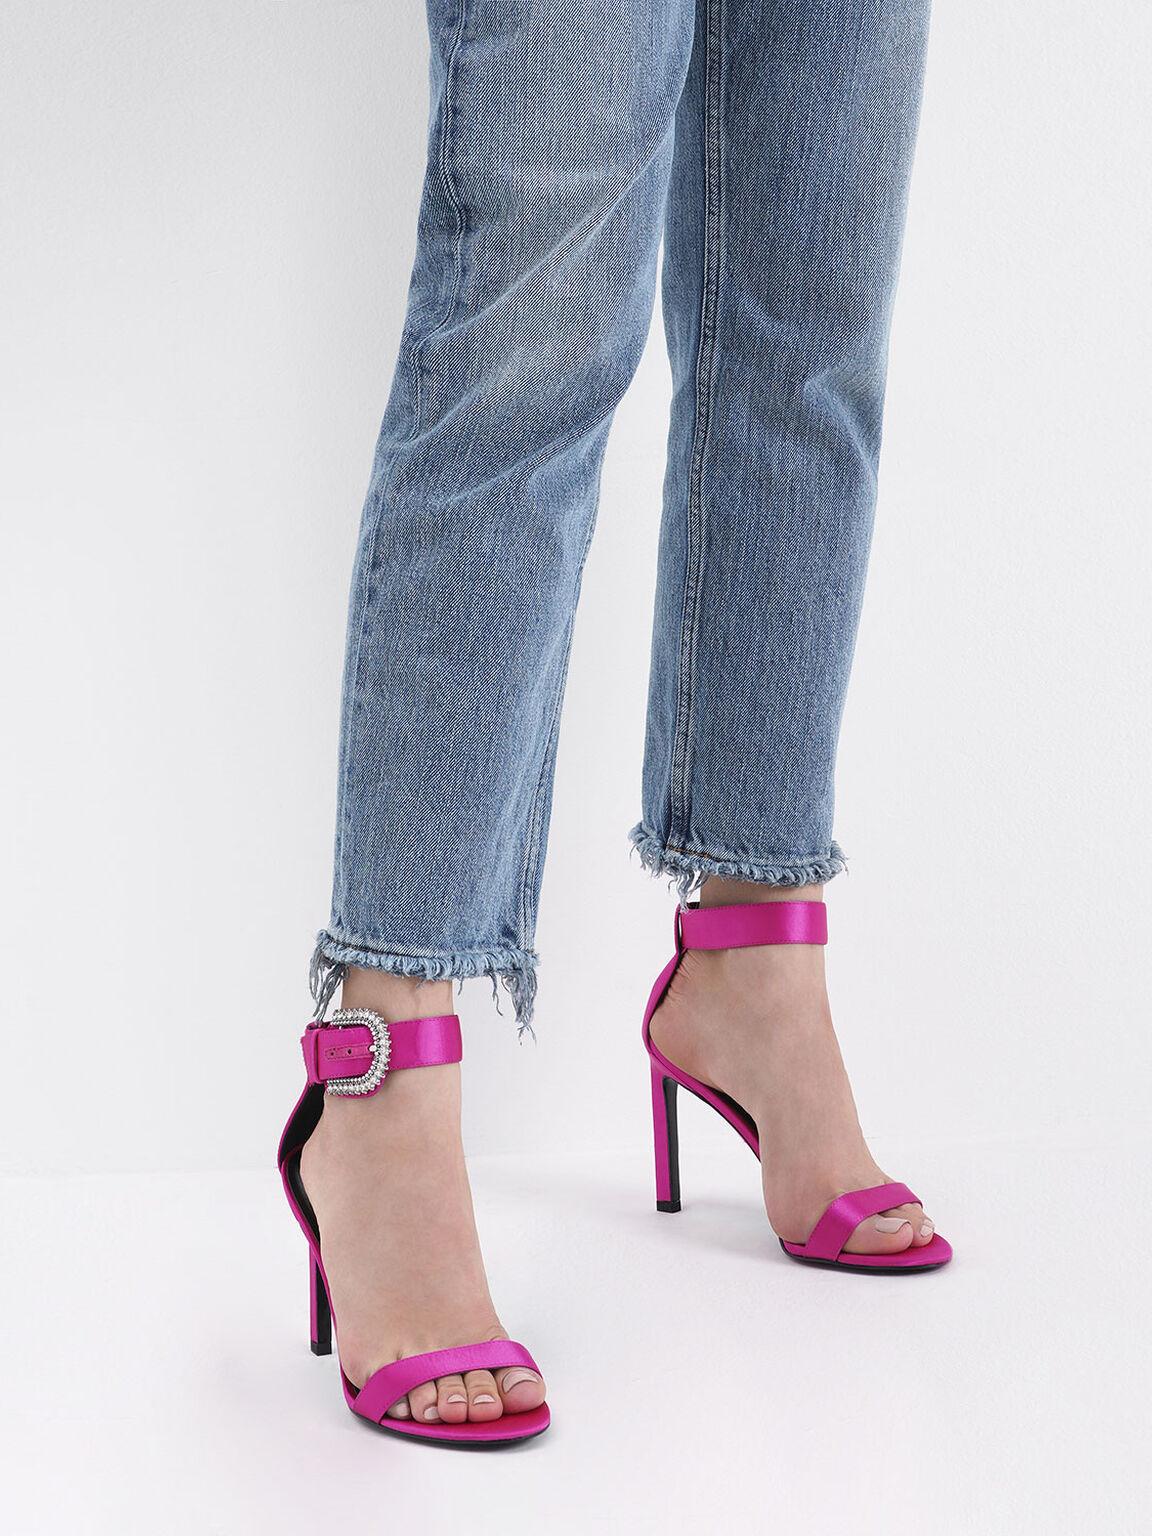 Satin Embellished Buckle Stiletto Heels, Fuchsia, hi-res